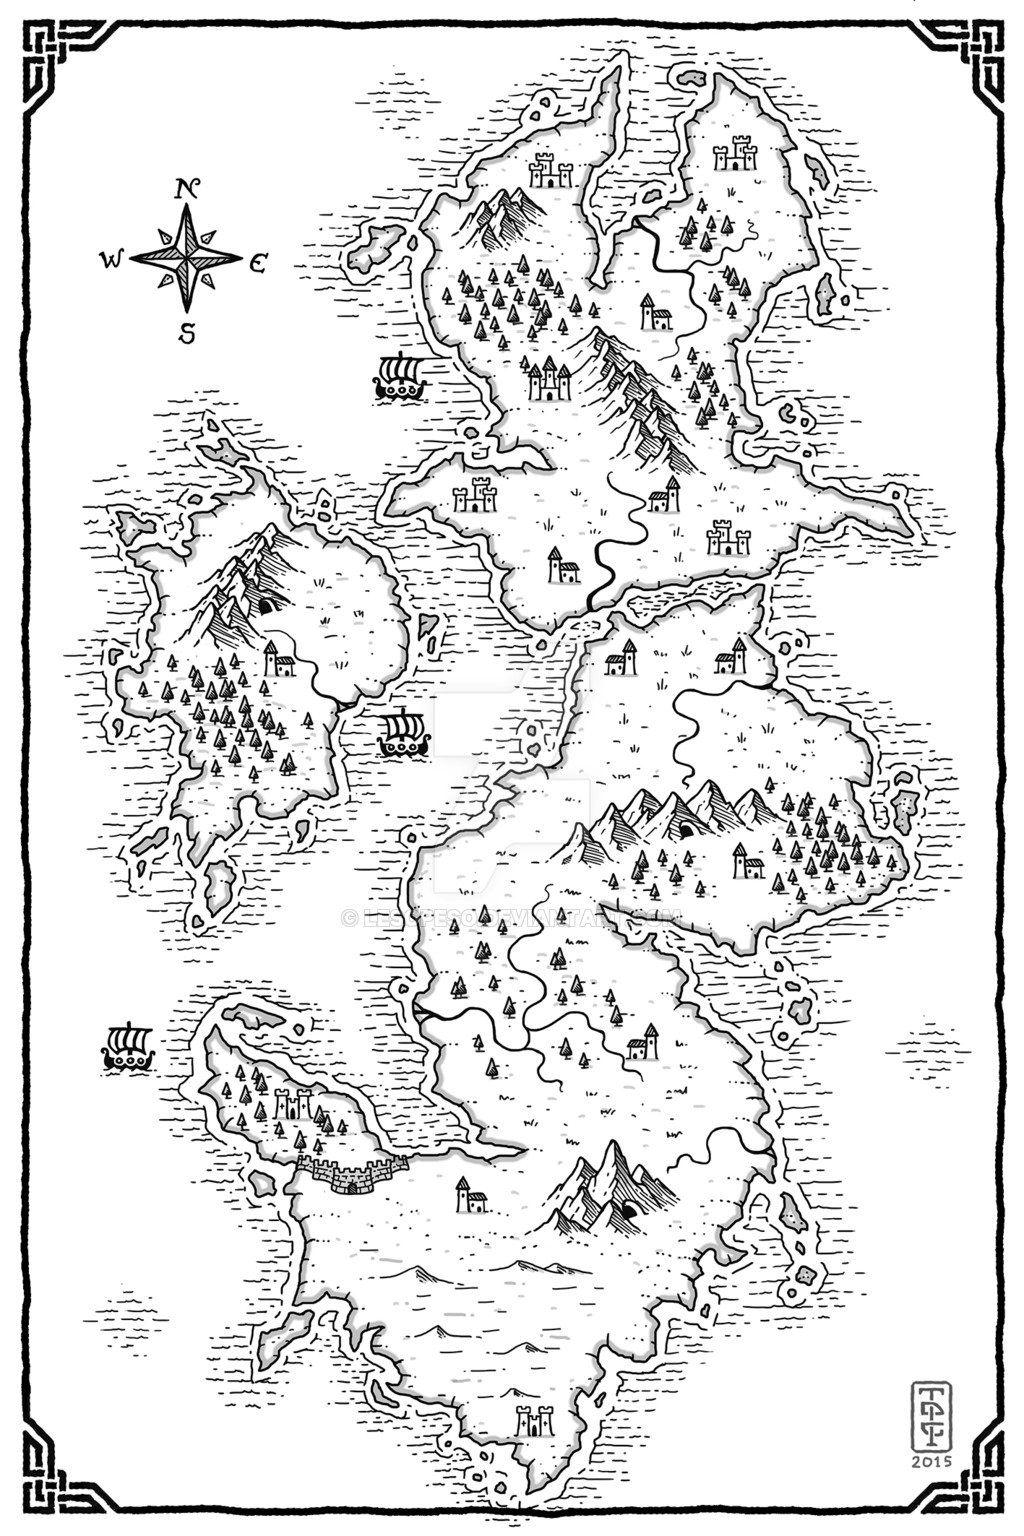 Unity Line Art Map : Ben ️ gdc eigenbom twitter … pinteres…